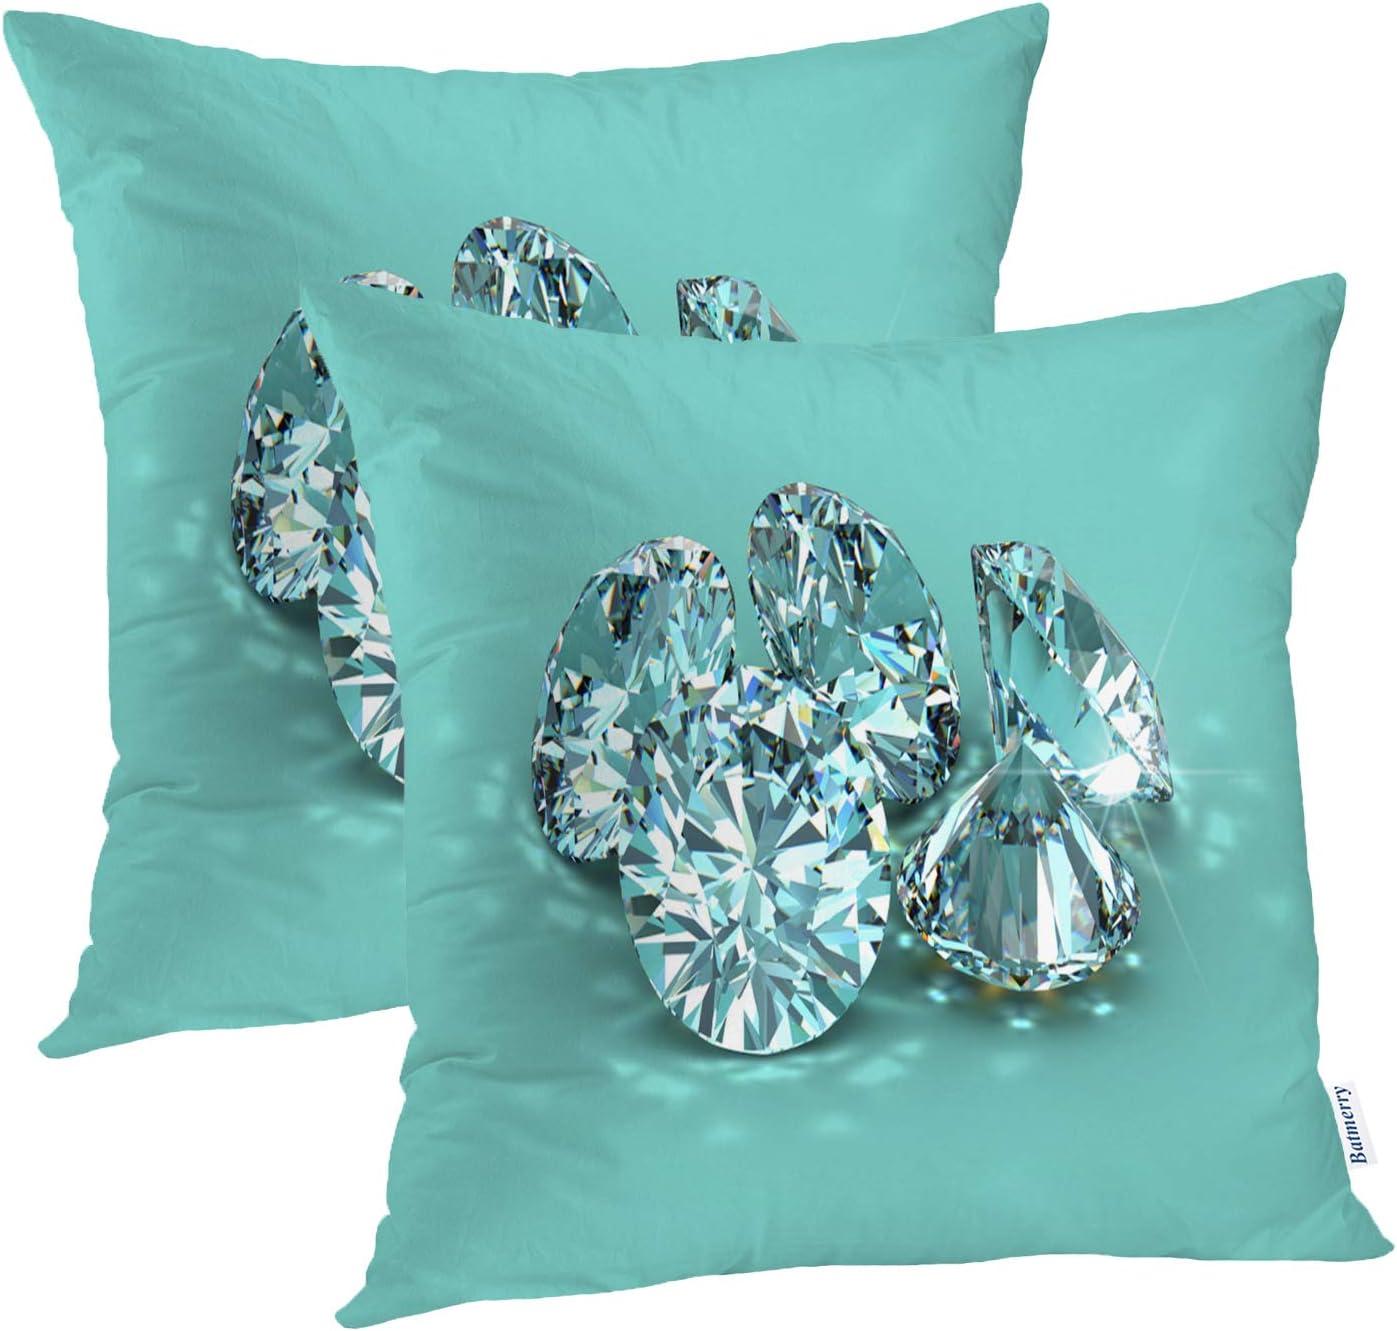 Batmerry Love Pillow Decorative Throw